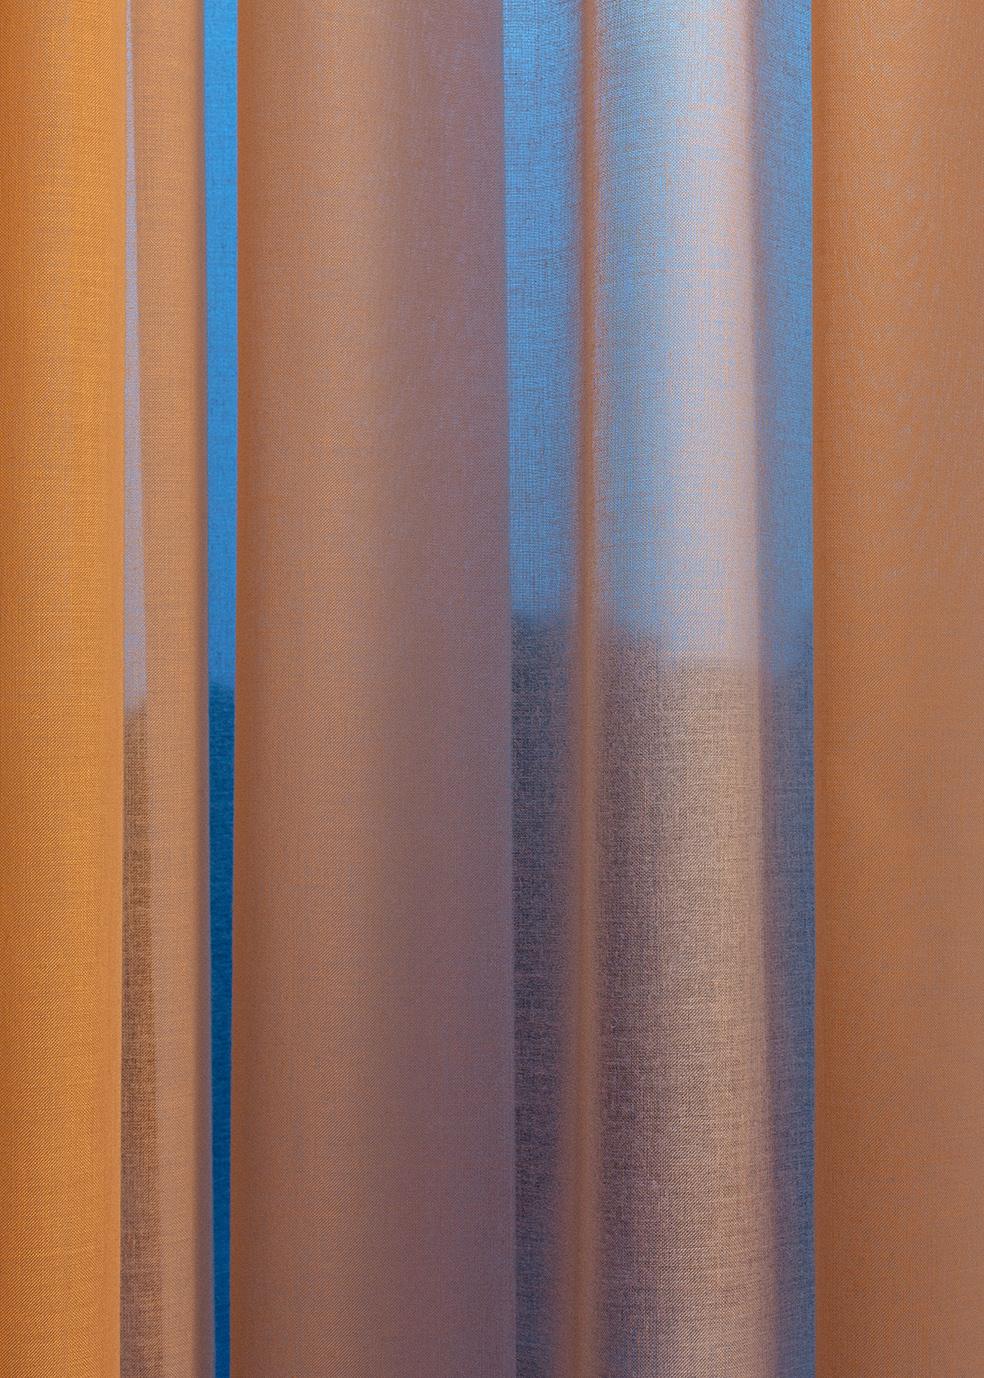 """untitled (l'heure bleue)"", Fine Art Print on Photo Rag Paper, 35 x 25 cm, 2015 Edition of 3 + 2 AP. Courtesy der Künstler & Galerie Jette Rudolph, Berlin"